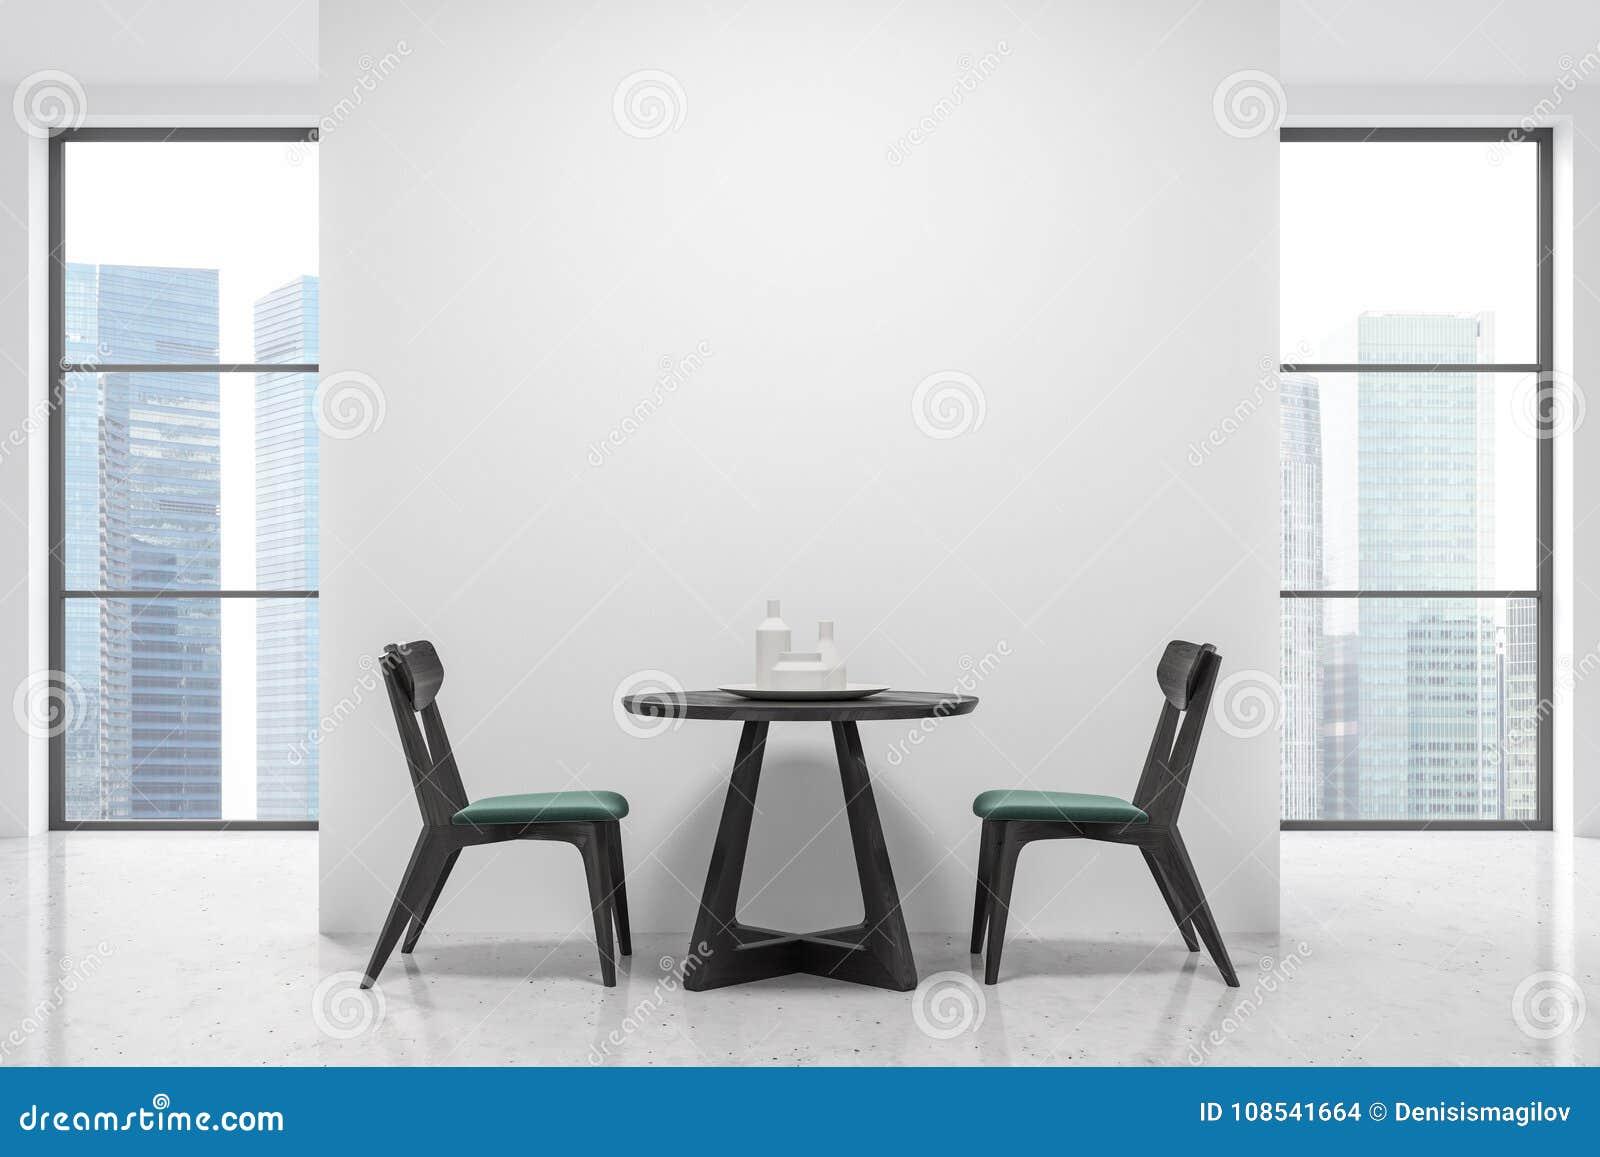 Witte Tafel Zwarte Stoelen.Rondetafel En Groene En Zwarte Stoelen Vensters Stock